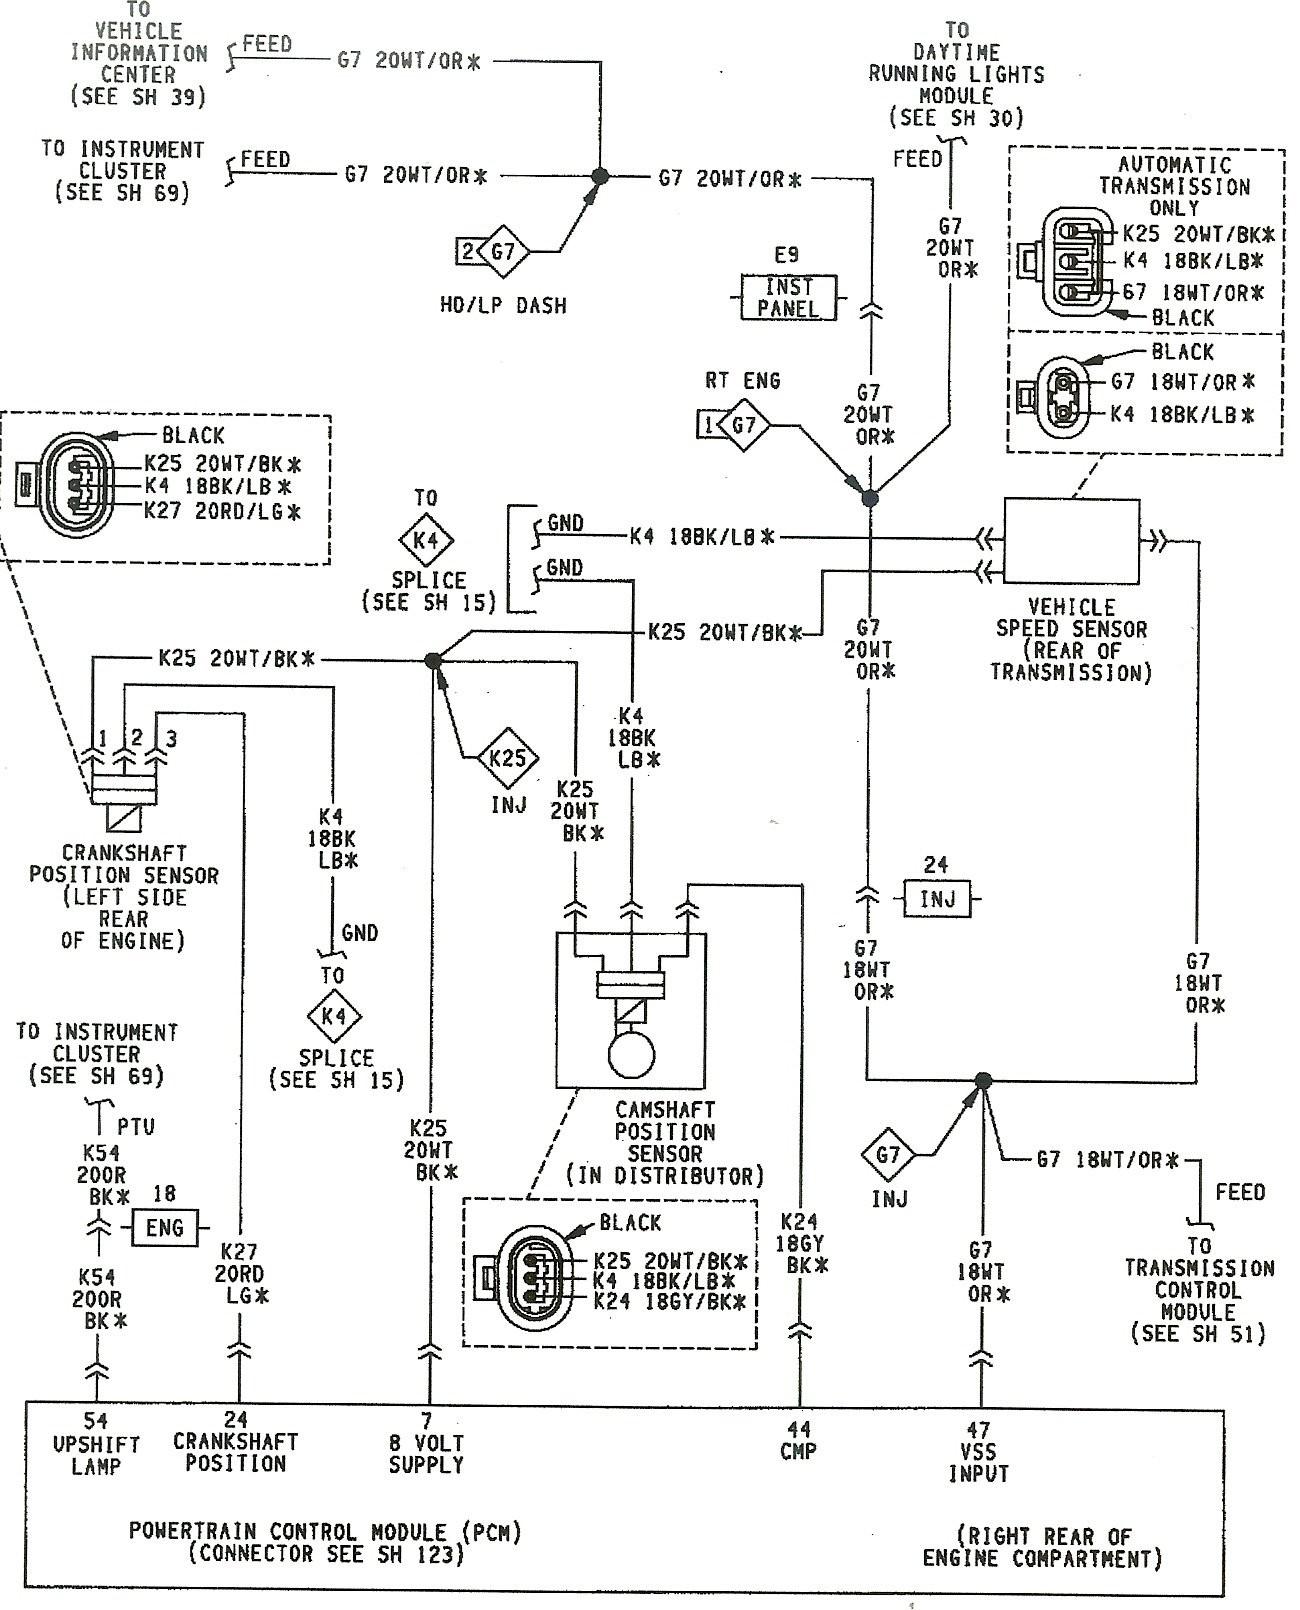 2006 Jeep Grand Cherokee Engine Diagram Grand Cherokee I Have A 93 Jeep Grand Cherokee with A 4 0l Of 2006 Jeep Grand Cherokee Engine Diagram